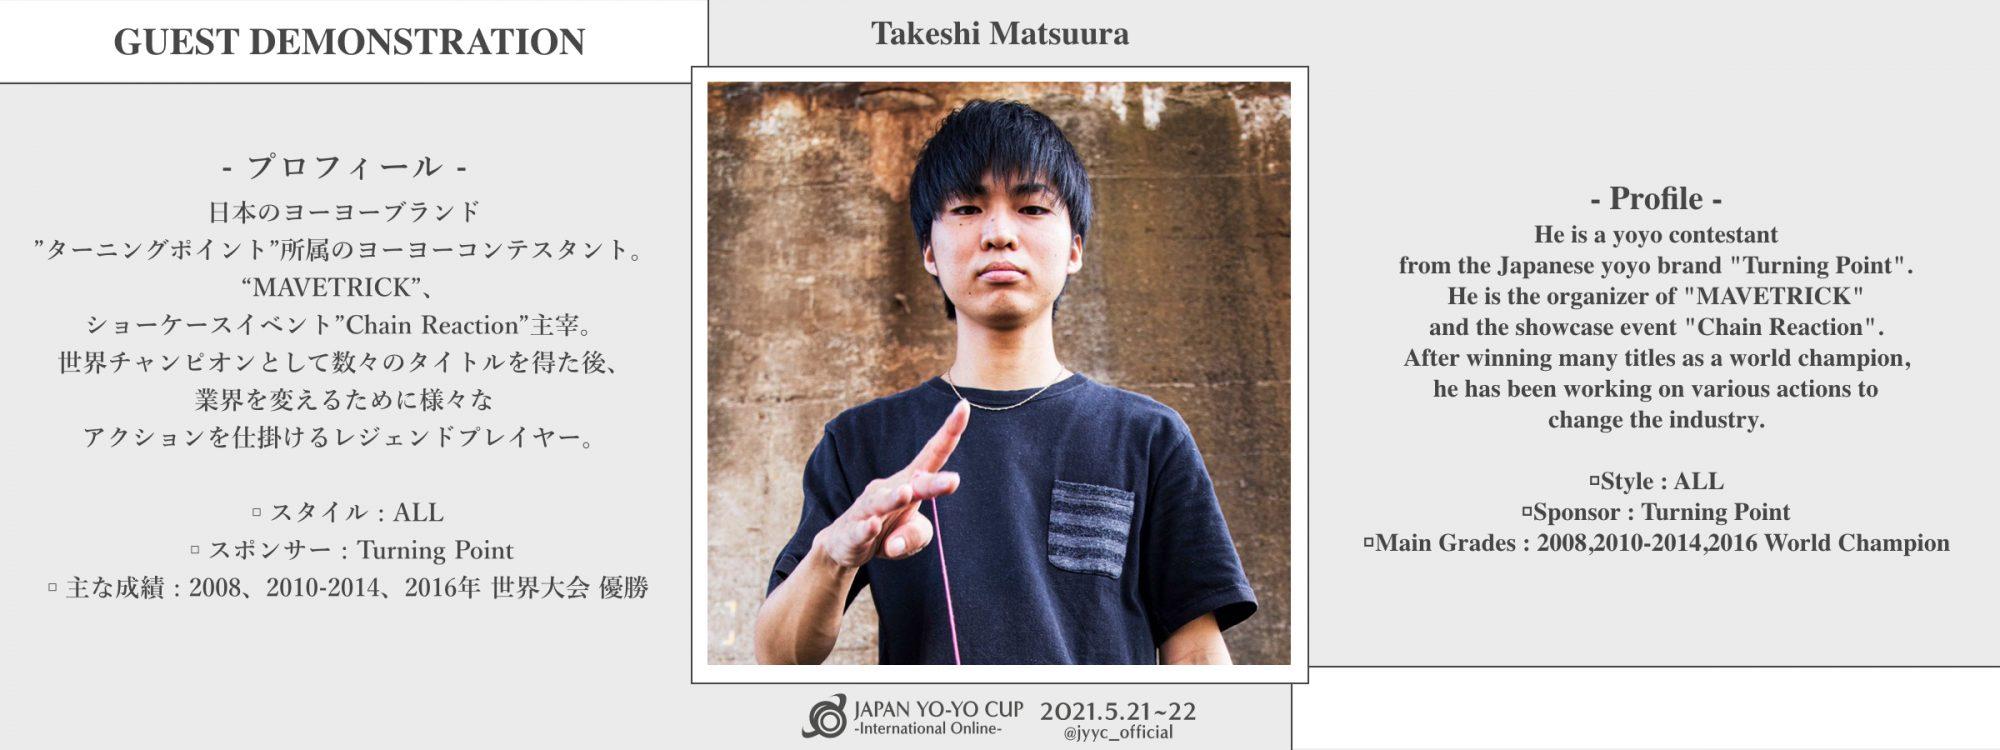 #JYYCIO 2021 ゲストデモンストレーションプレイヤー紹介! / Guest demonstration player introduction!